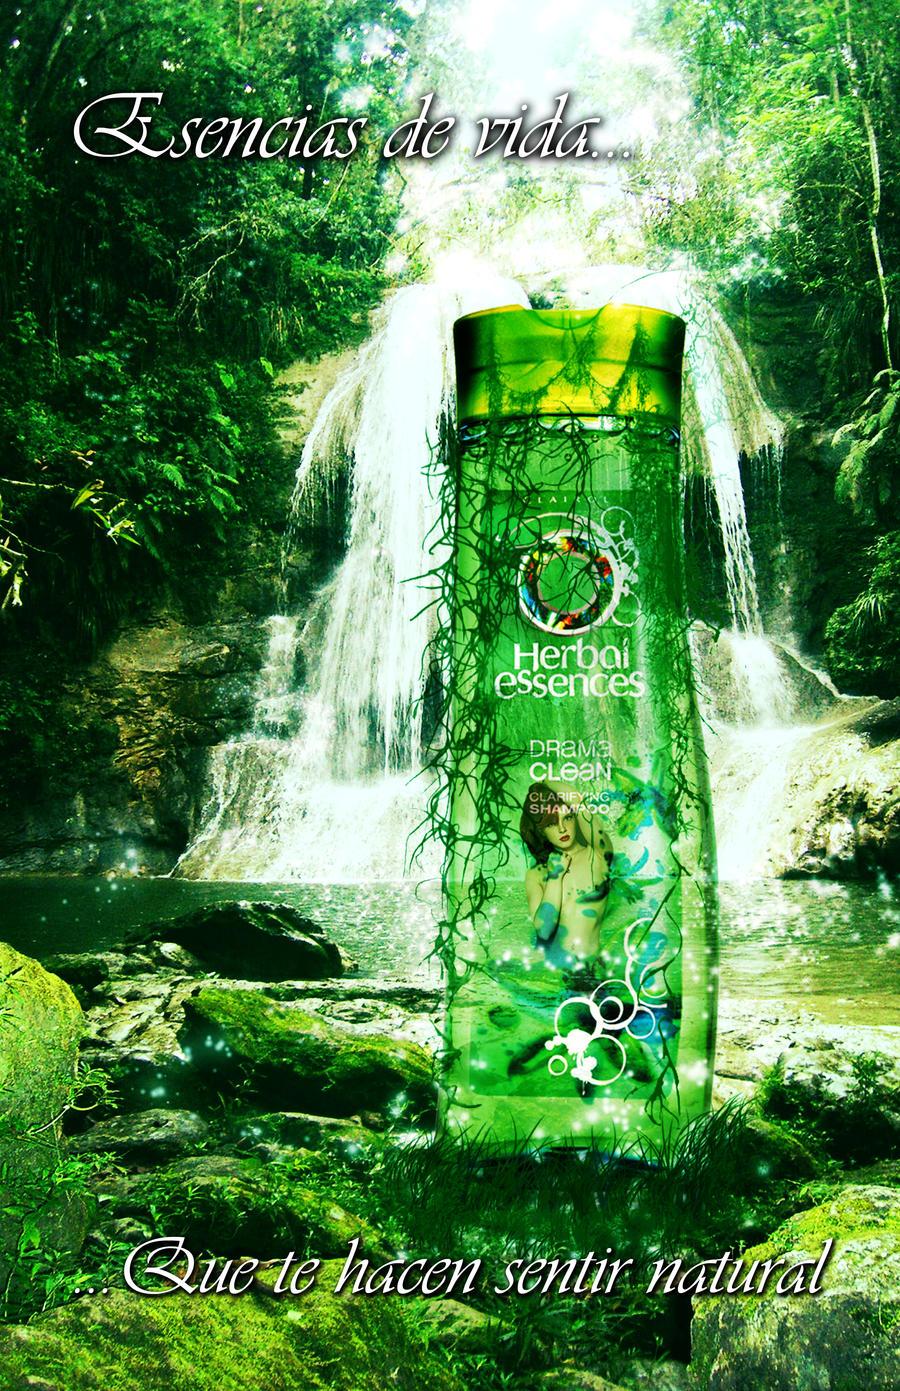 Herbal Essences Slogan - #traffic-club